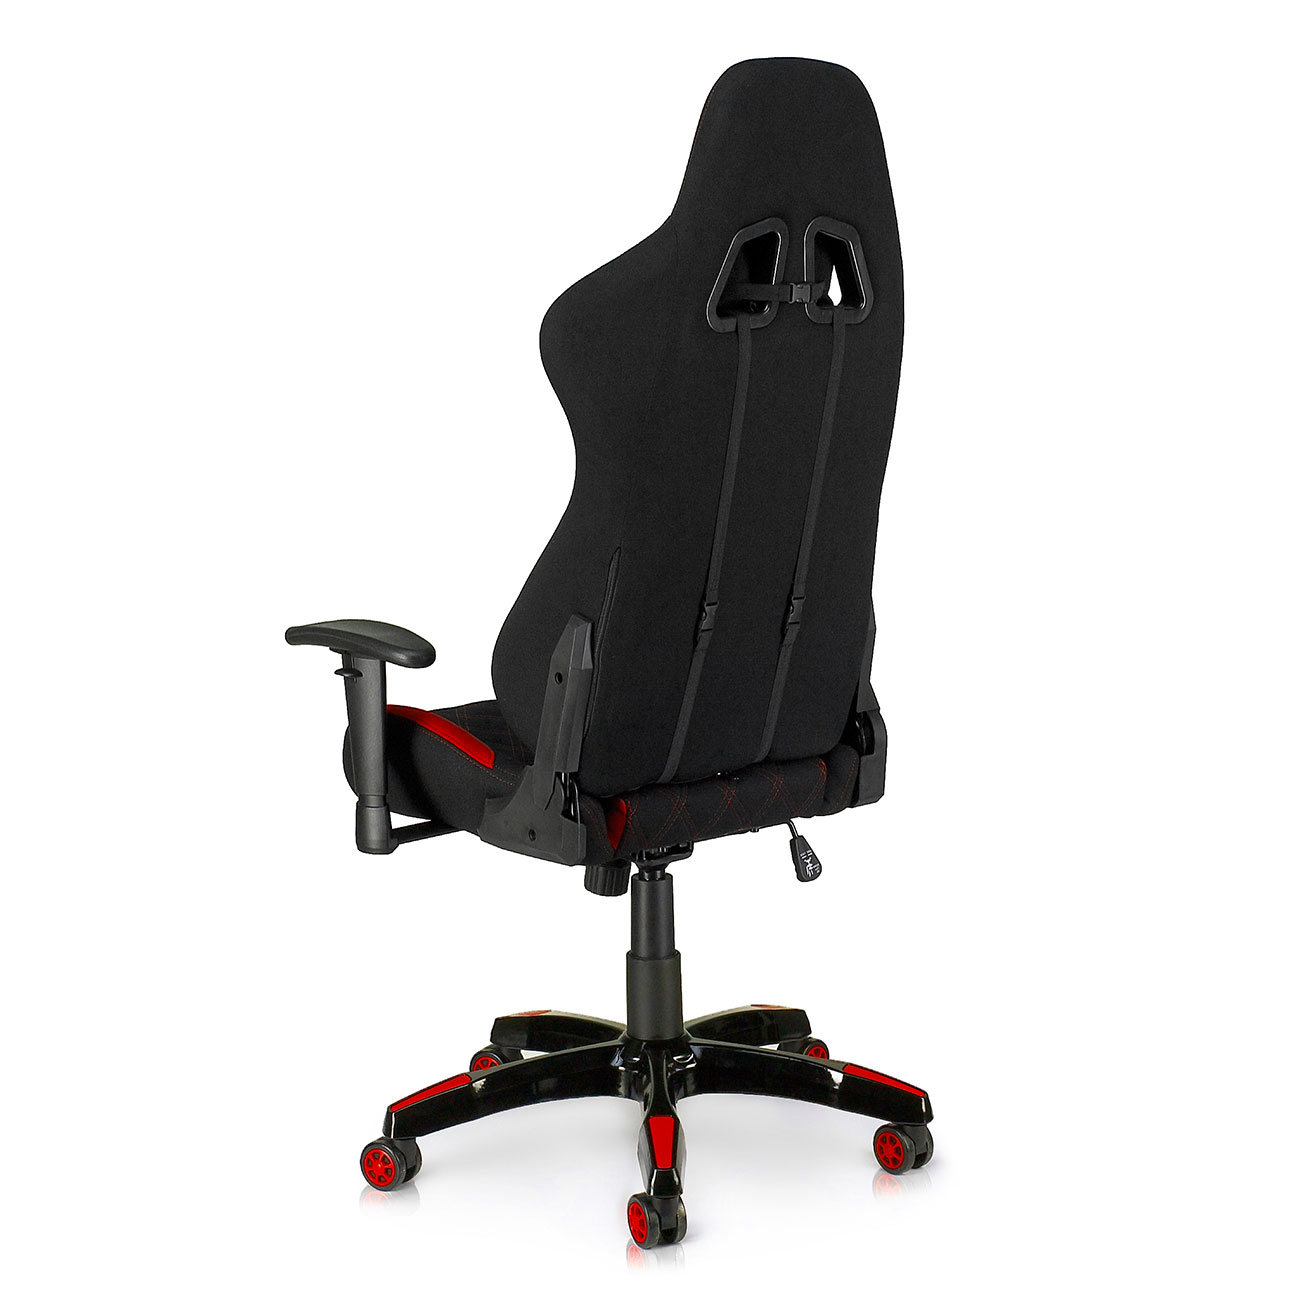 my sit chaise de bureau fauteuil si ge racing red racer bureau chaises racing. Black Bedroom Furniture Sets. Home Design Ideas